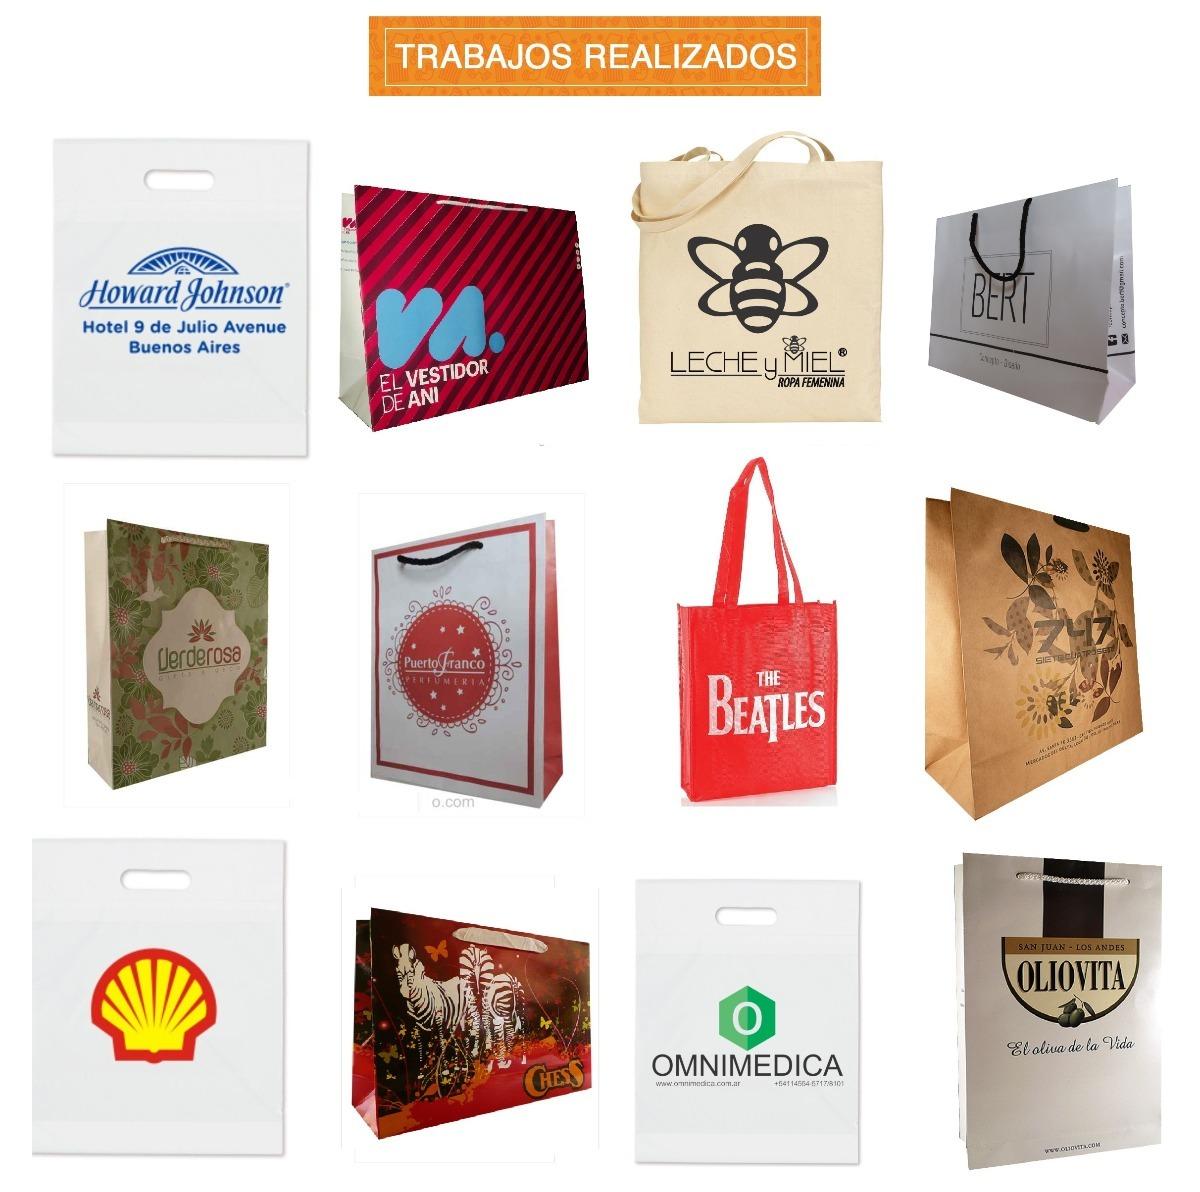 00293e515 Bolsas Friselina Para Una Botella Impresa Tu Marca - $ 15,00 en ...